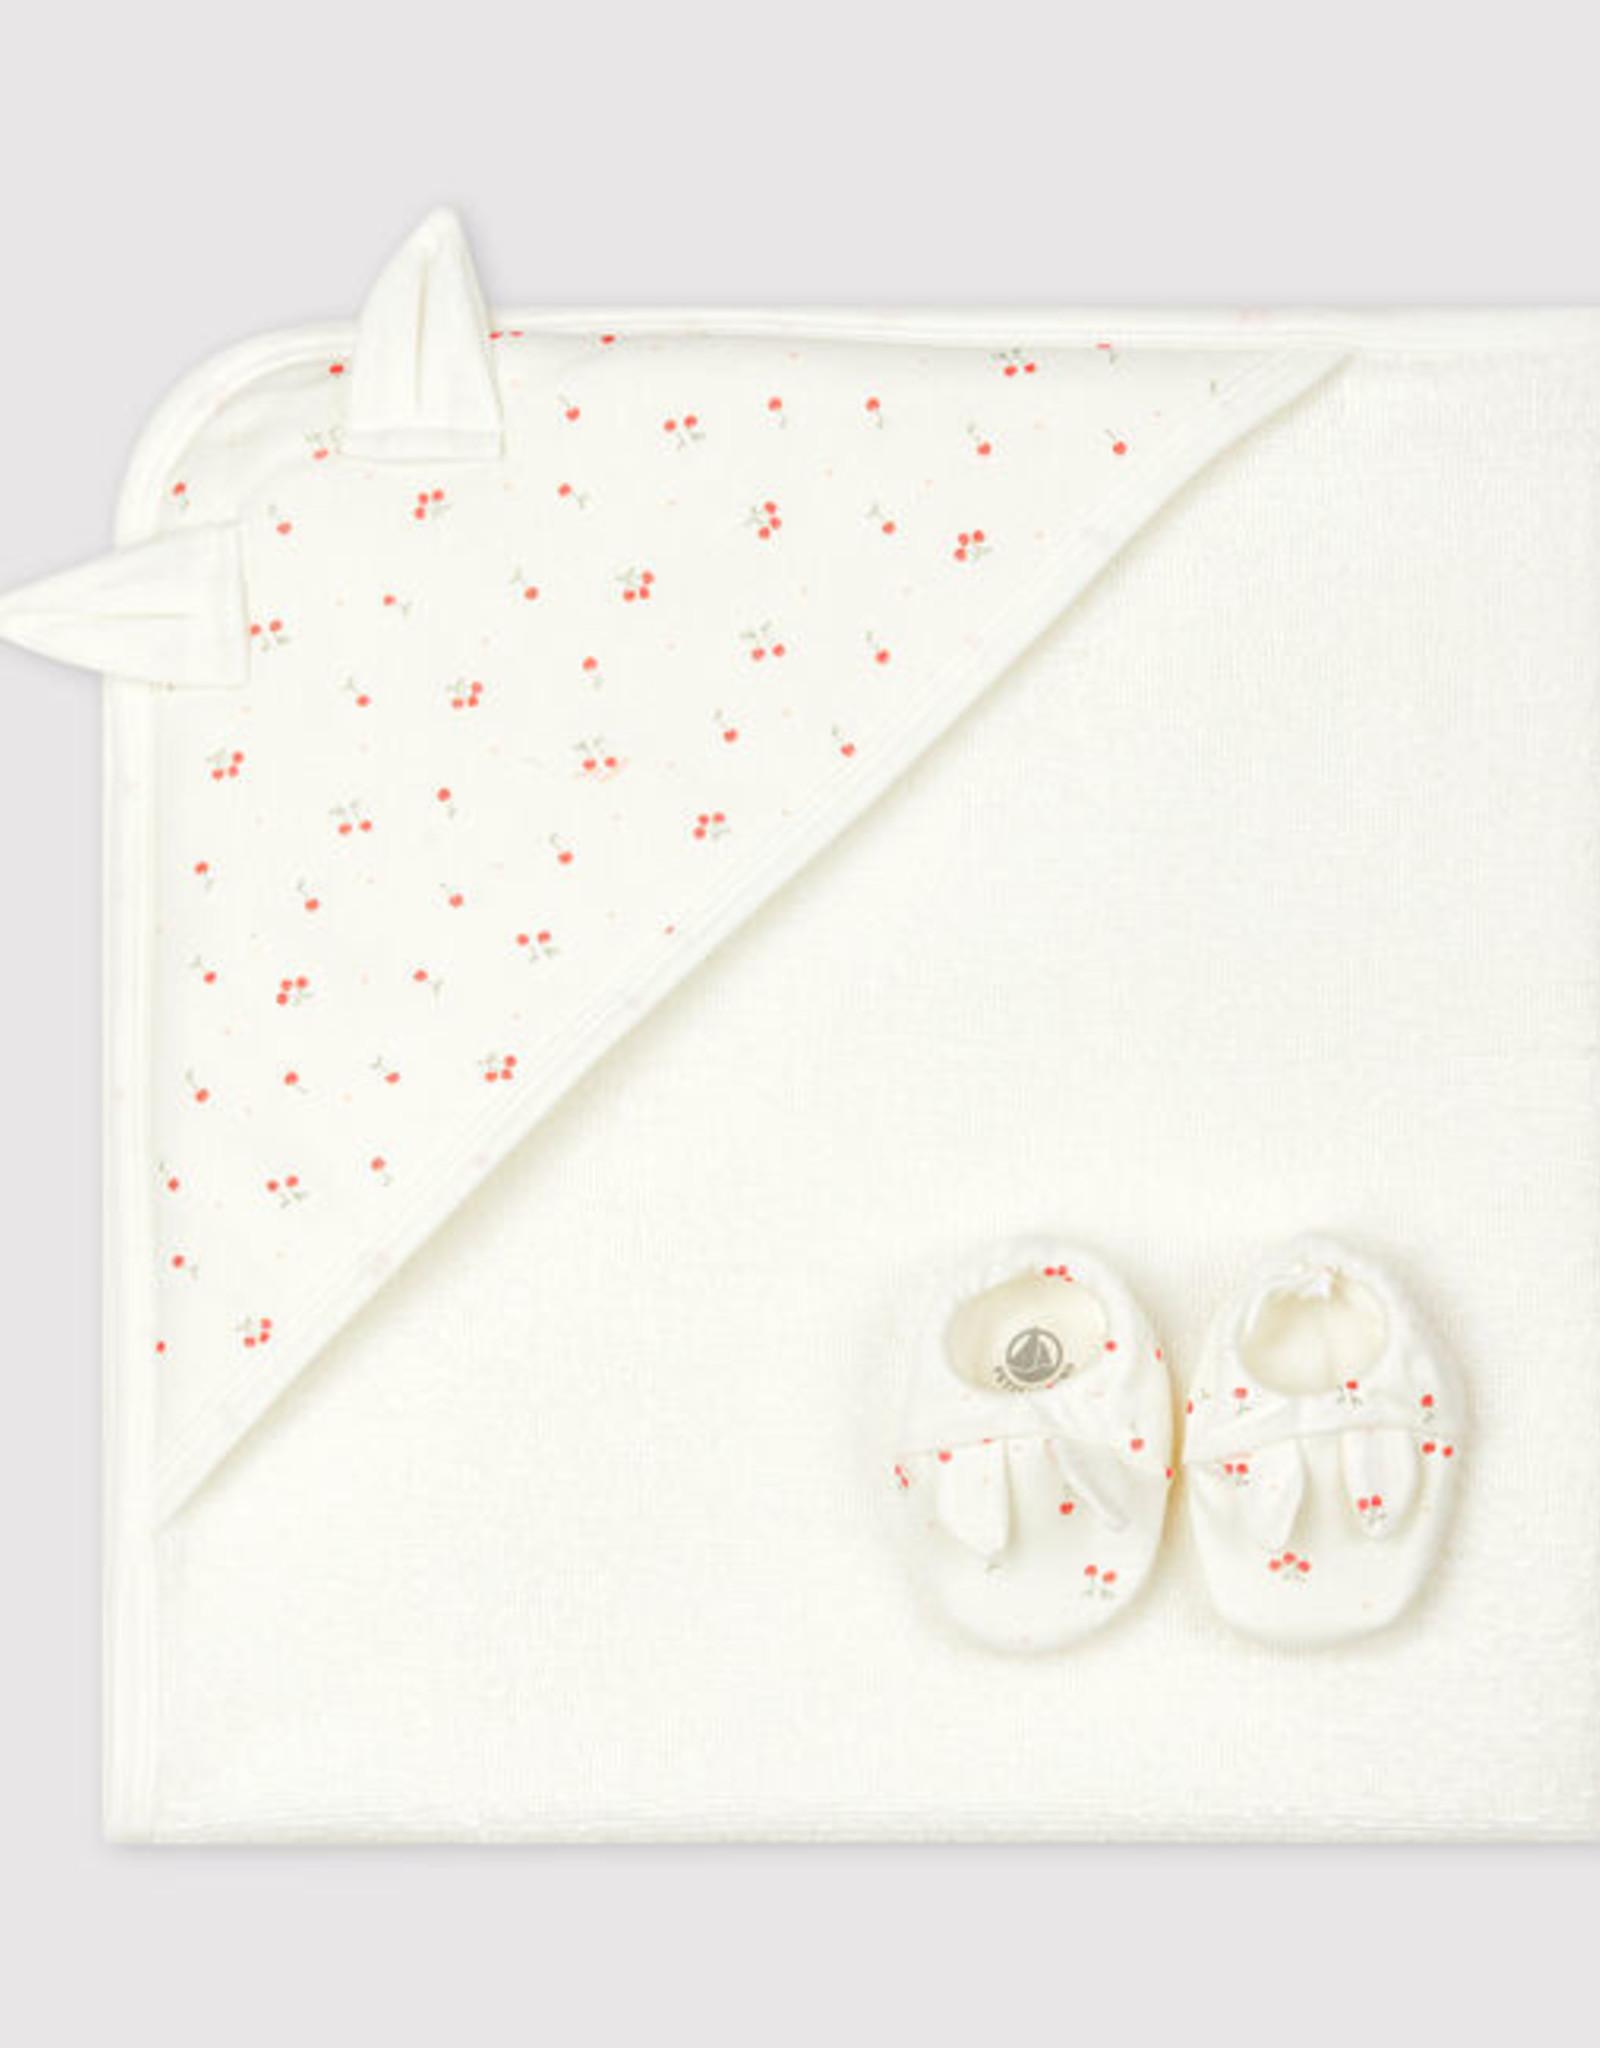 Petit Bateau Babies' Square Bath Towel and Bootees Set